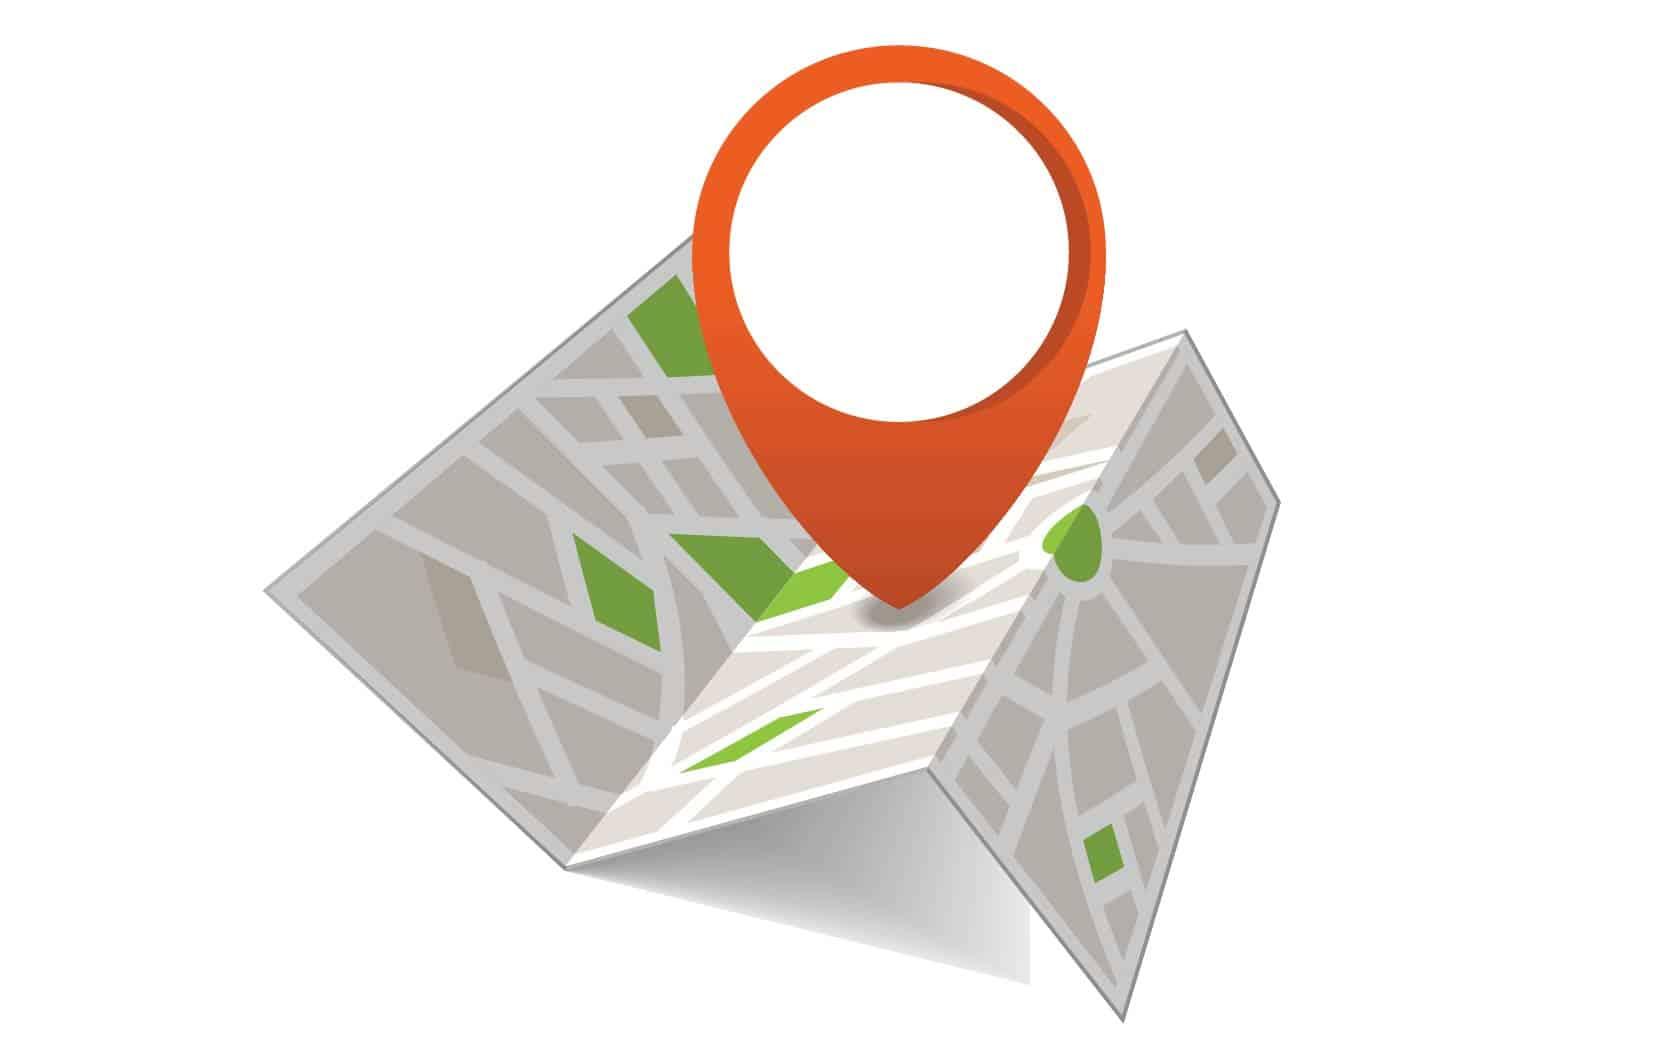 Untitled 1 04 - บริการออกแบบแผนที่บริษัท แผนที่ร้าน แผนผังต่างๆ